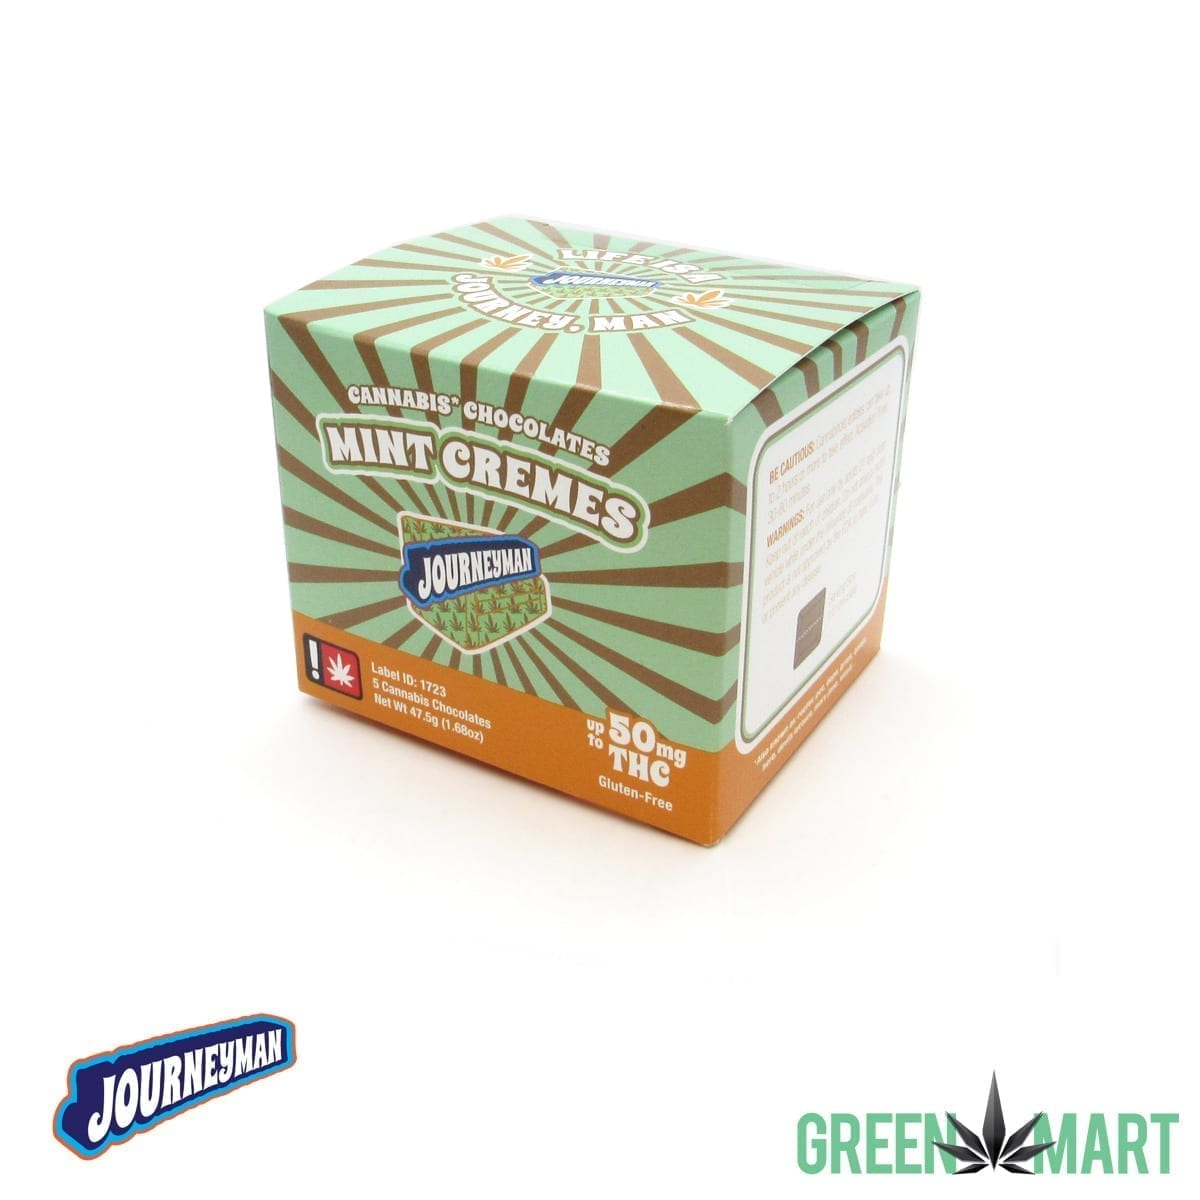 Journeyman Mint Cremes Box